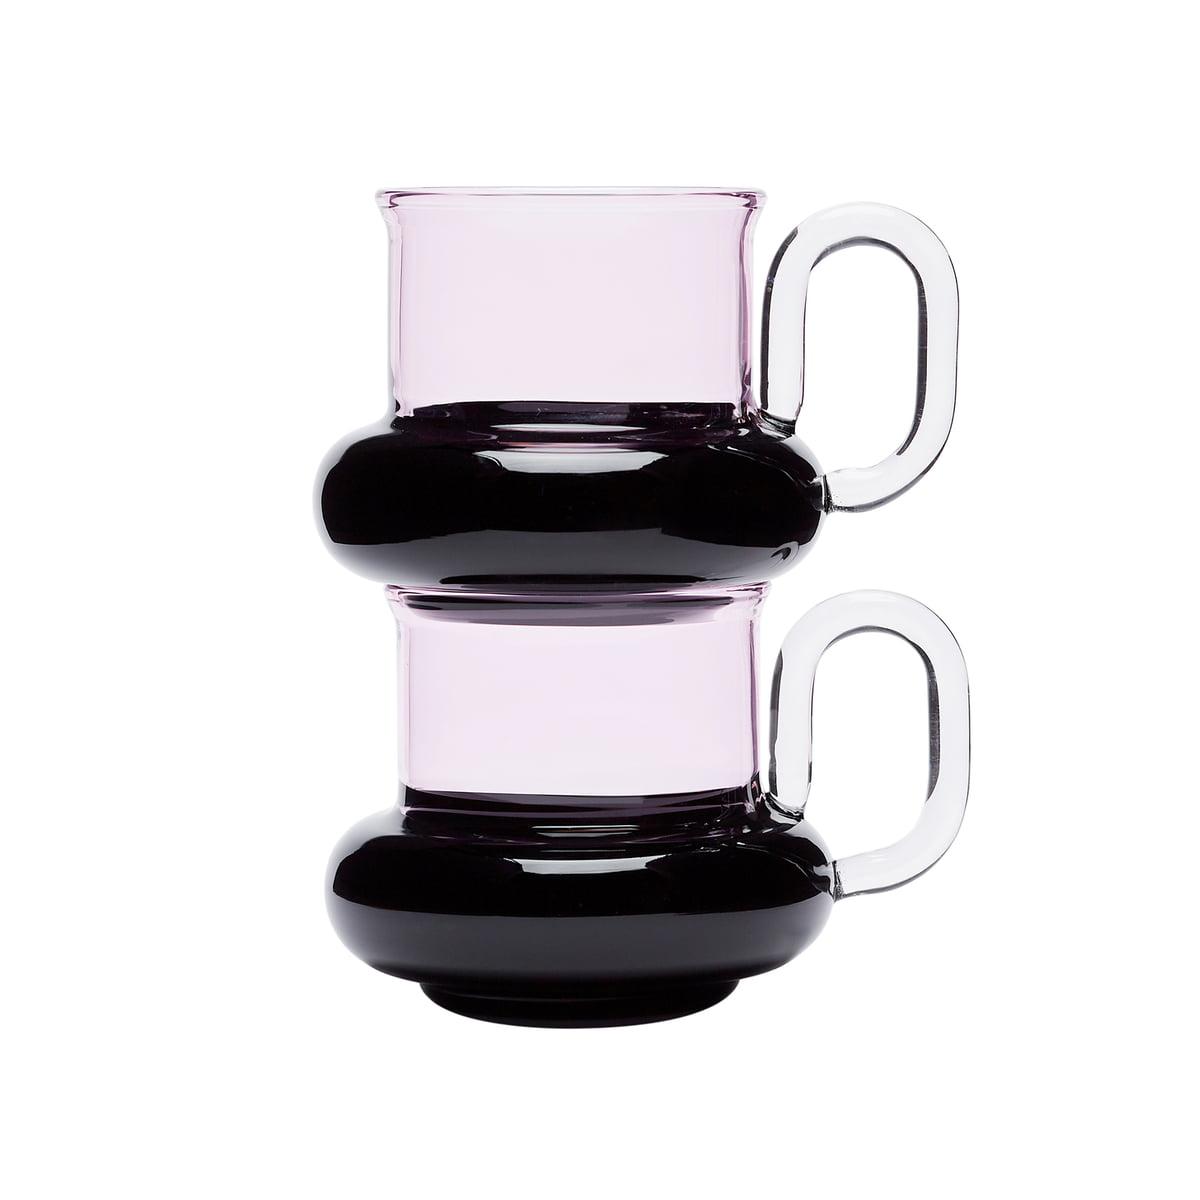 bump teacup by tom dixon connox. Black Bedroom Furniture Sets. Home Design Ideas